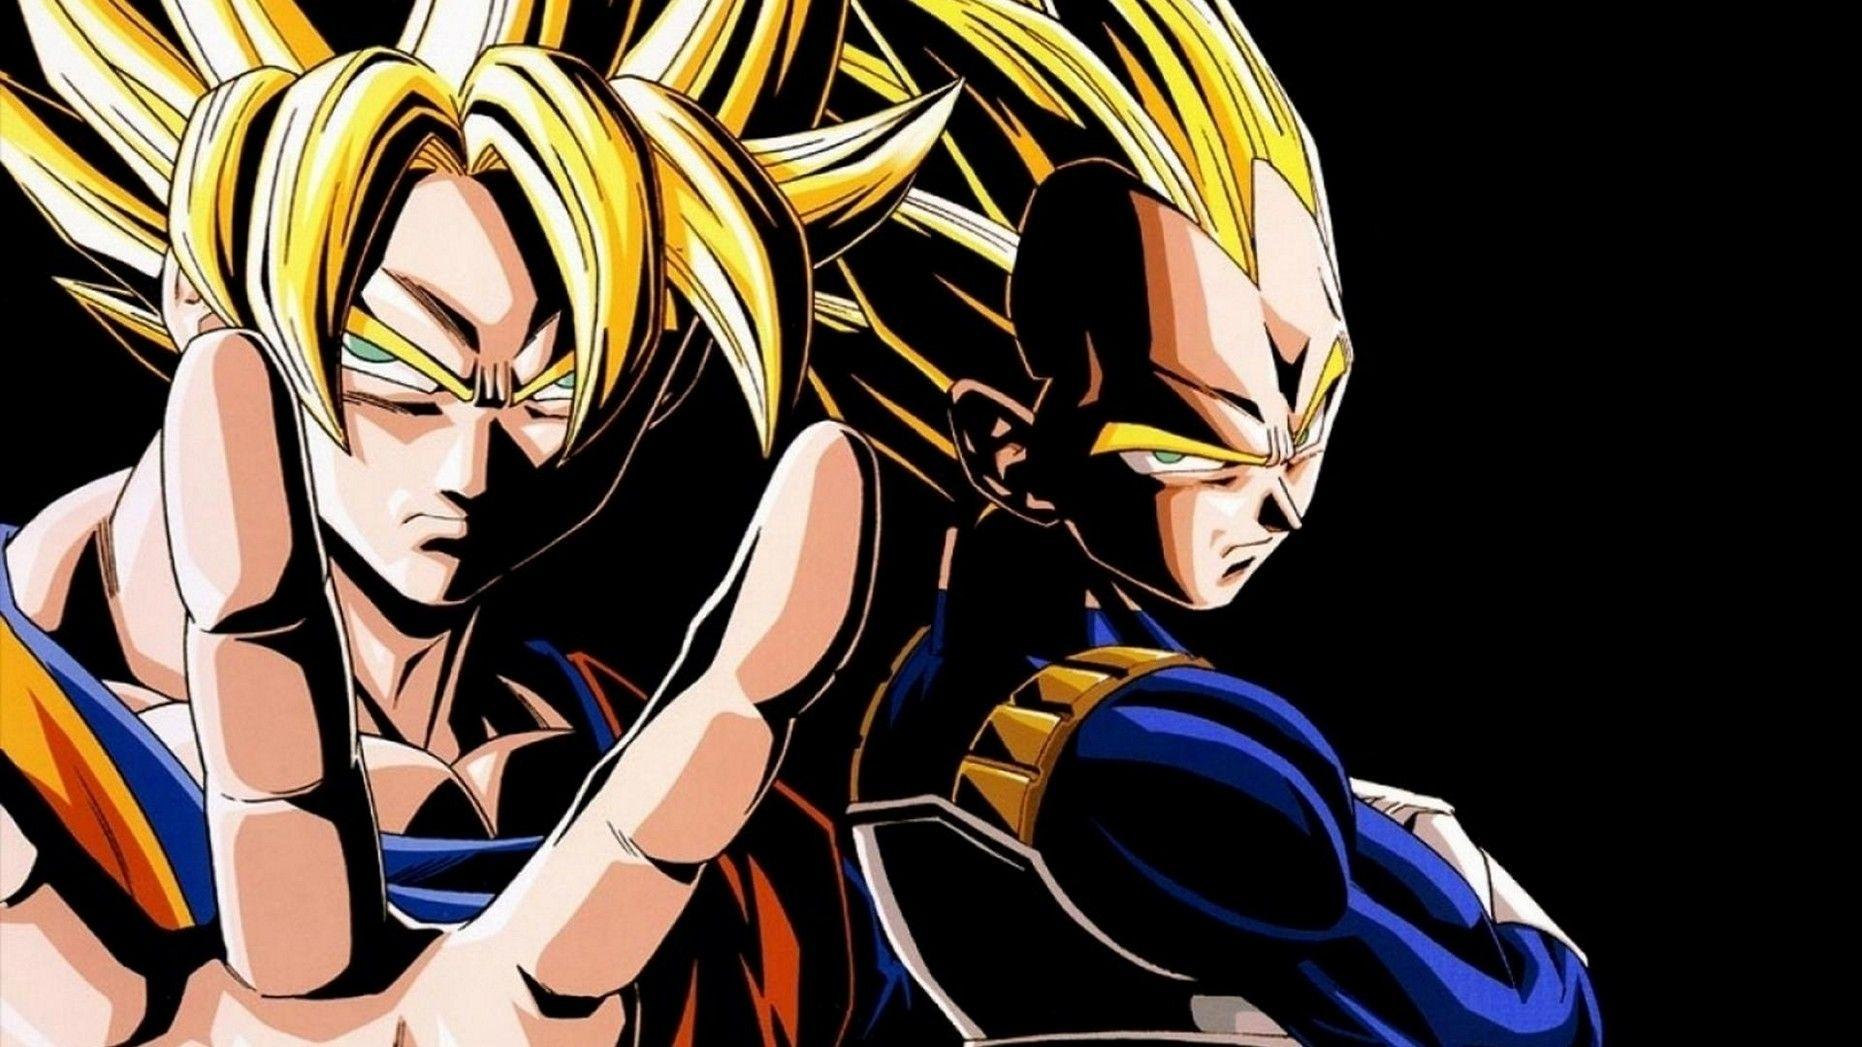 Black Goku Fondo De Pantalla And Fondo De Escritorio: Goku Vegeta Wallpapers